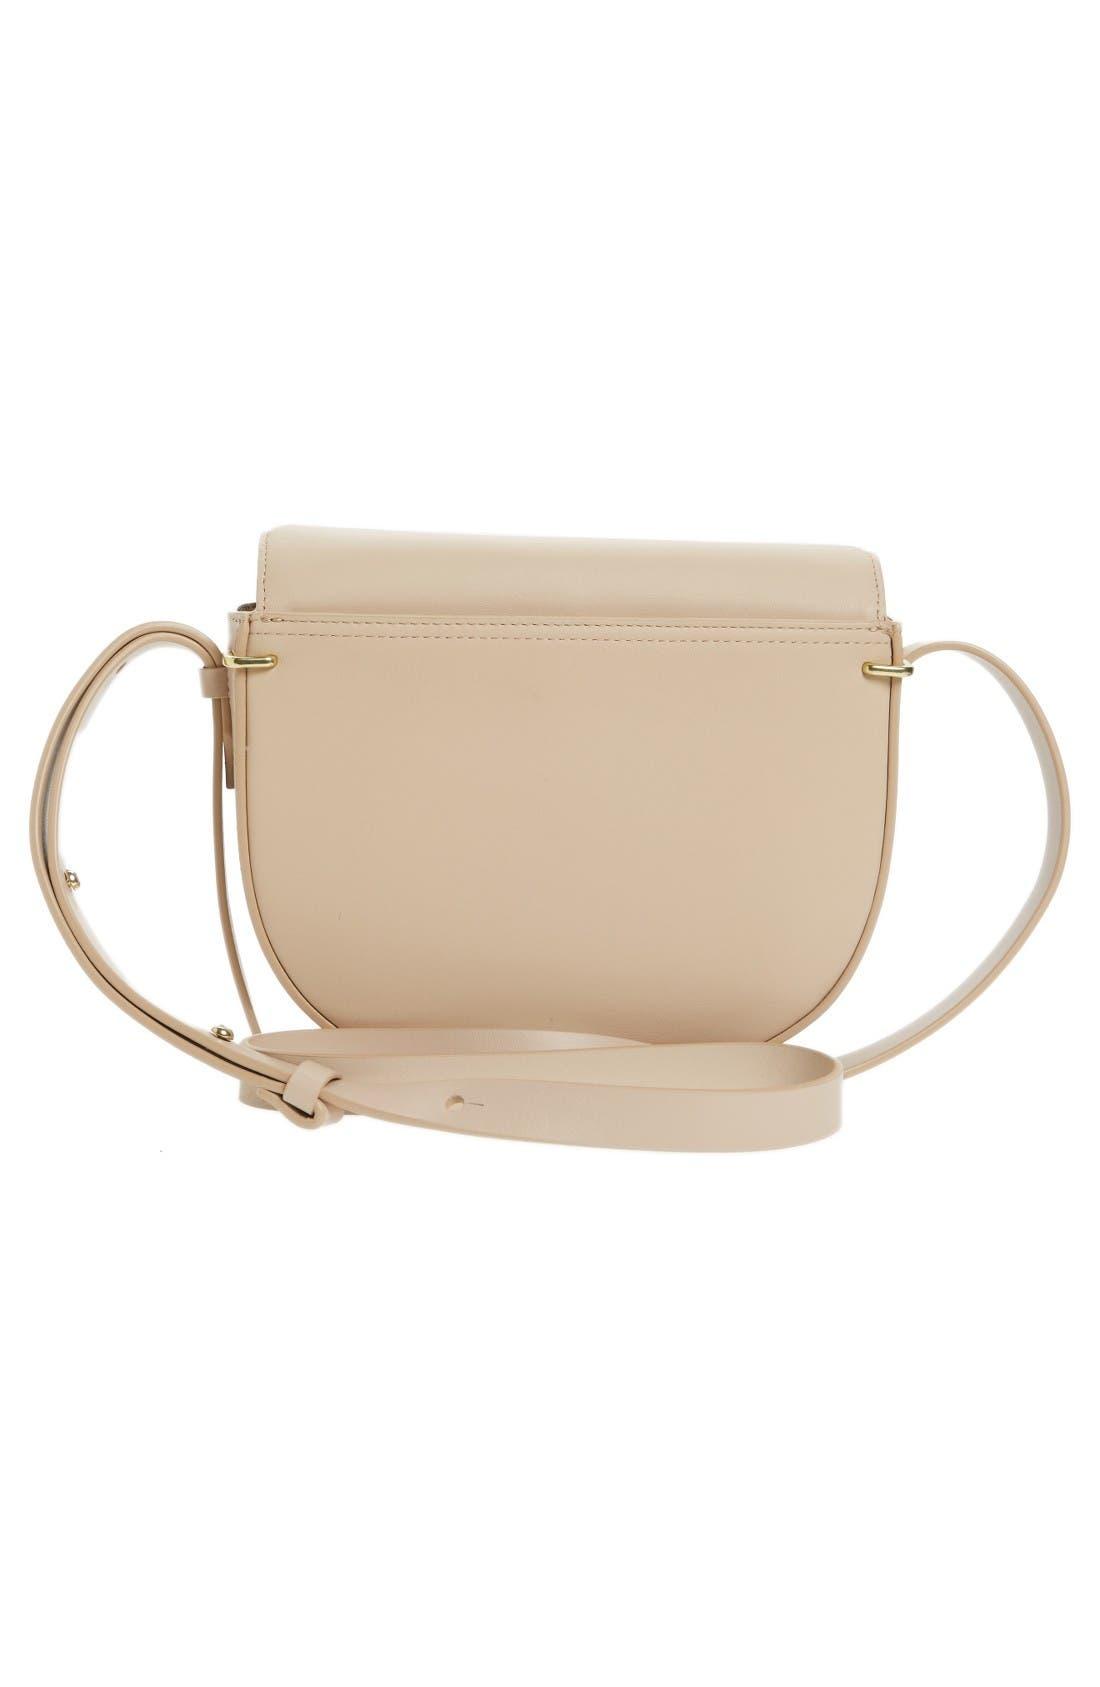 Alix Leather Saddle Bag,                             Alternate thumbnail 2, color,                             Cashew/ Gold